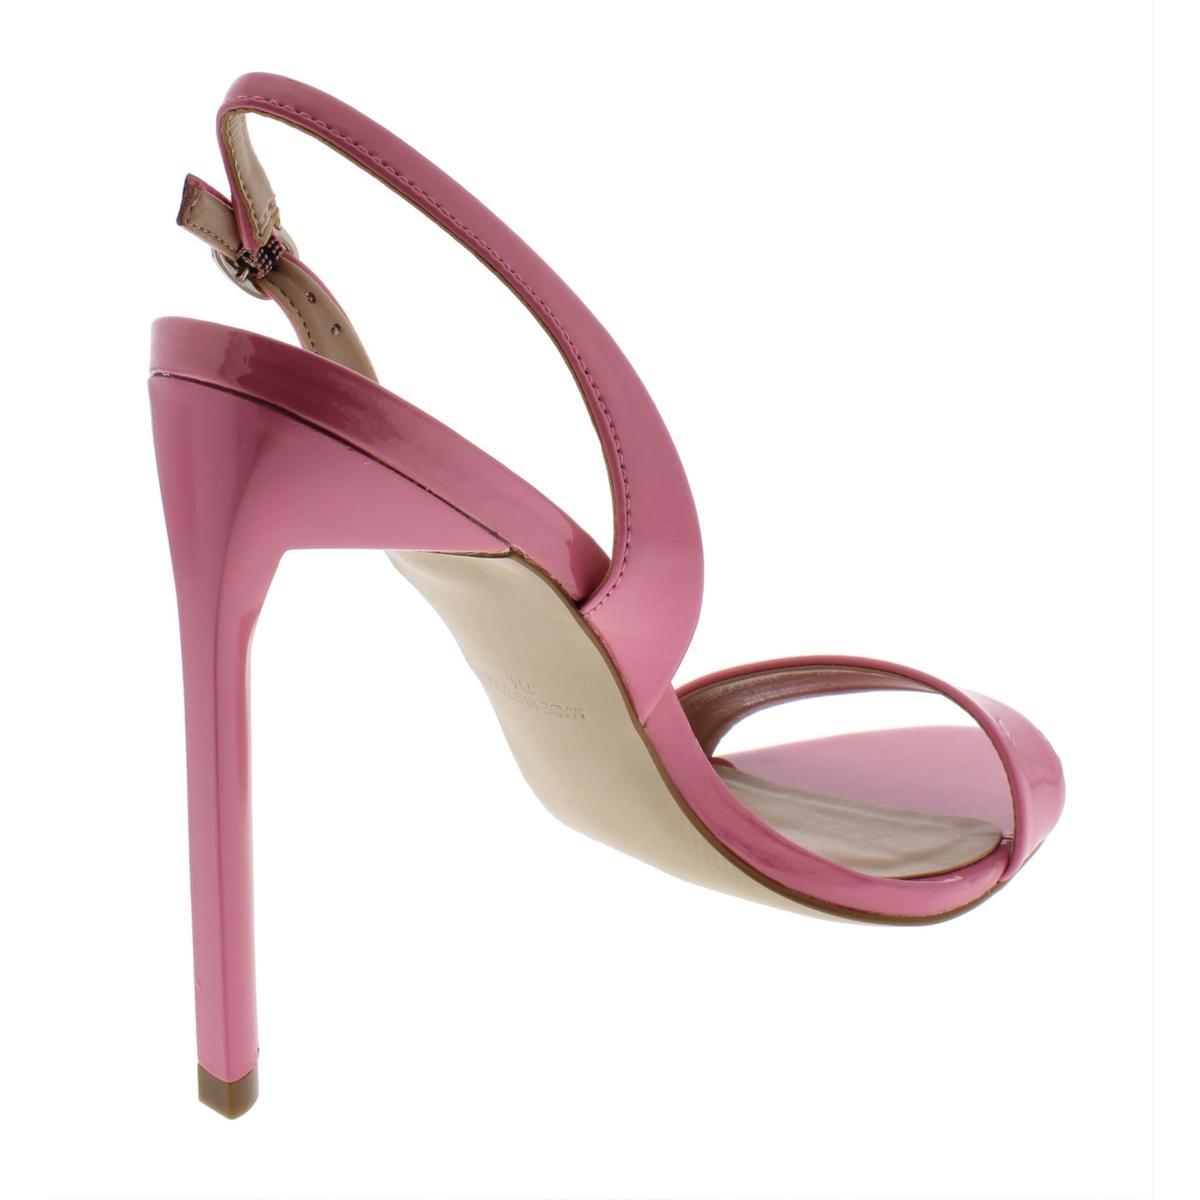 Steve-Madden-Womens-Corine-Patent-Leather-Stiletto-Dress-Sandals-Shoes-BHFO-2344 thumbnail 9